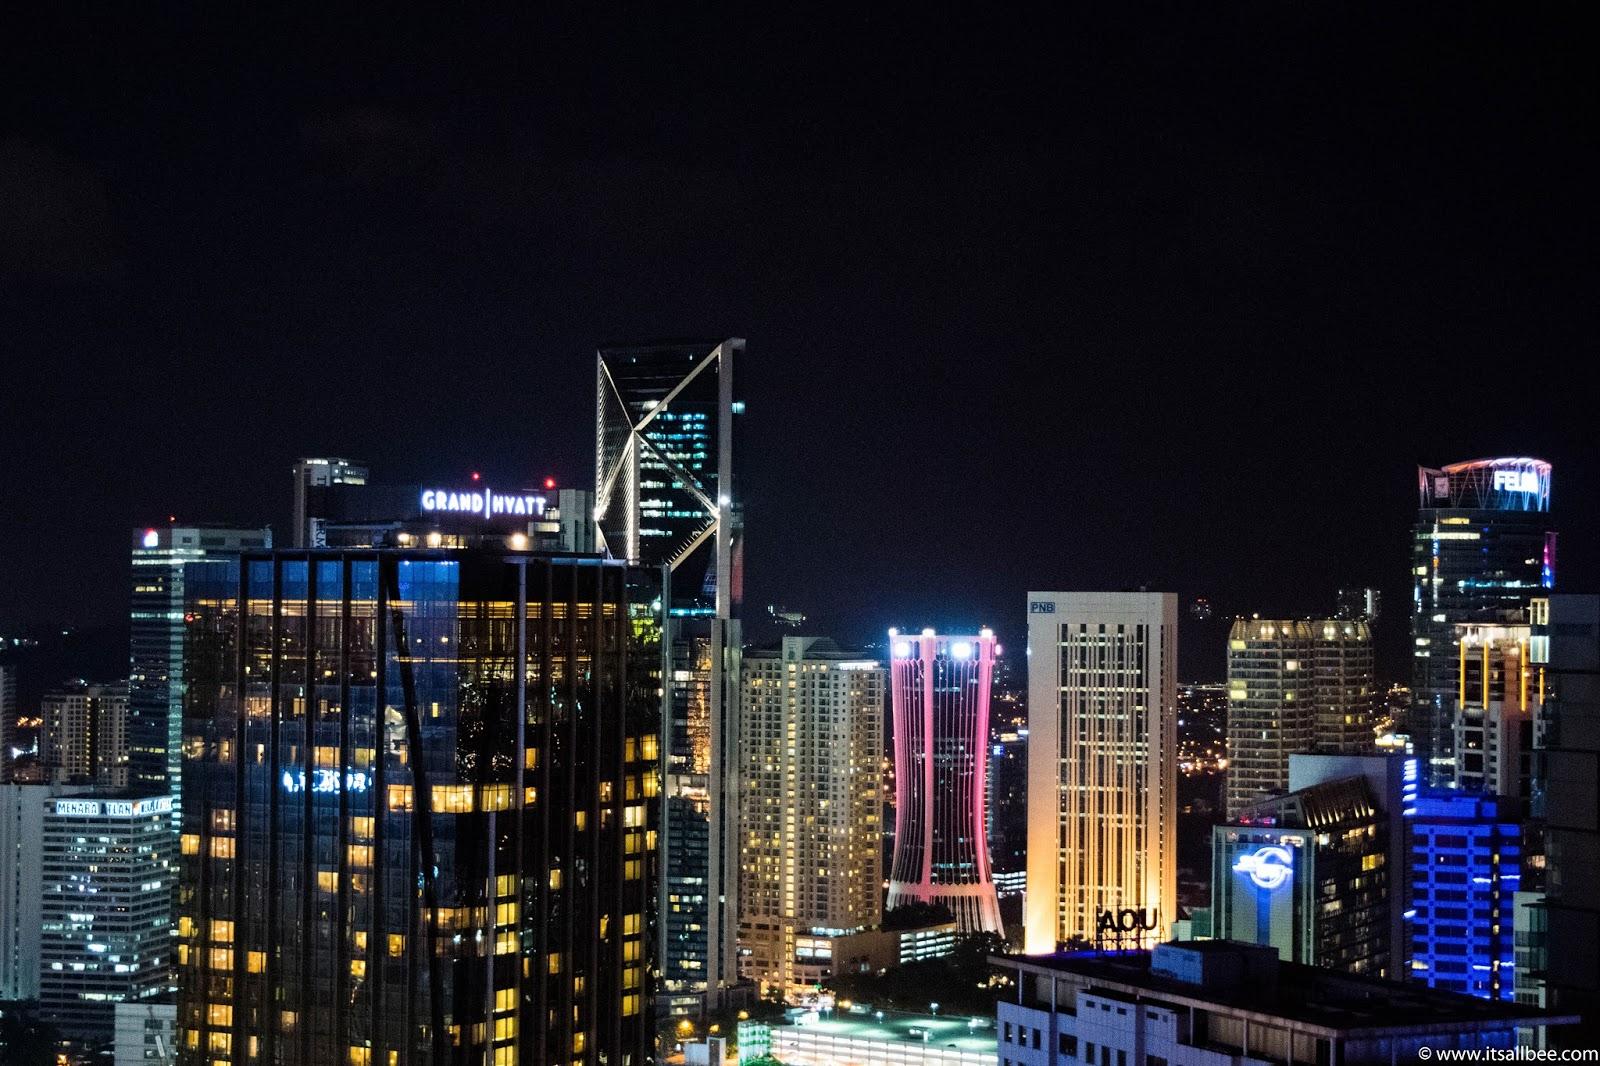 Malaysia's Best Kept Secret : Heli Lounge Bar In Kuala Lumpur